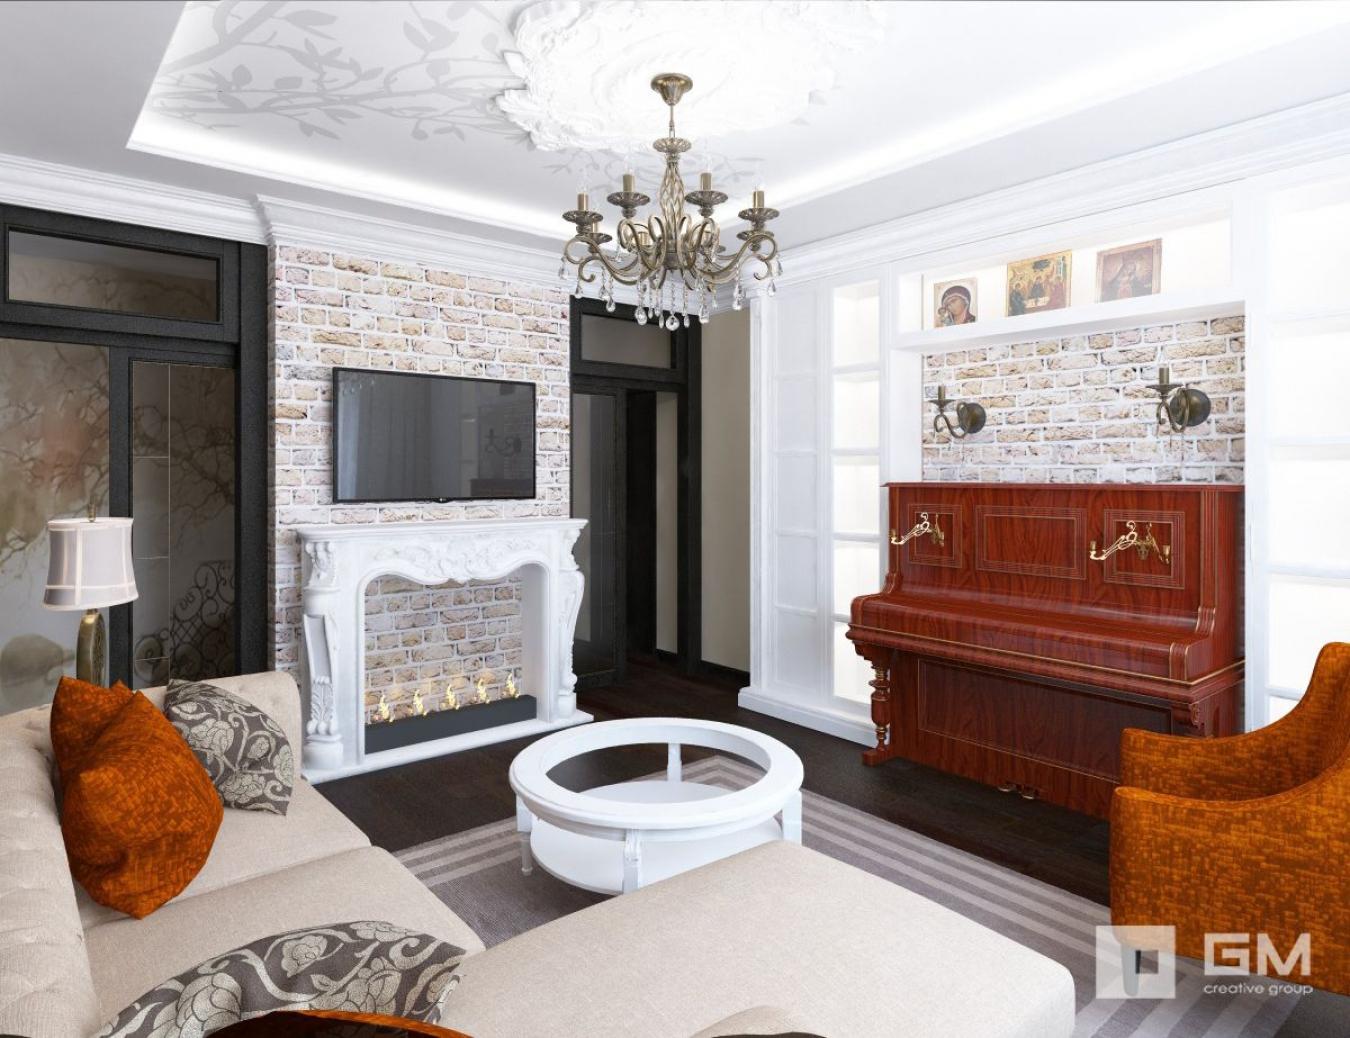 Интерьер комнаты с пианино фото